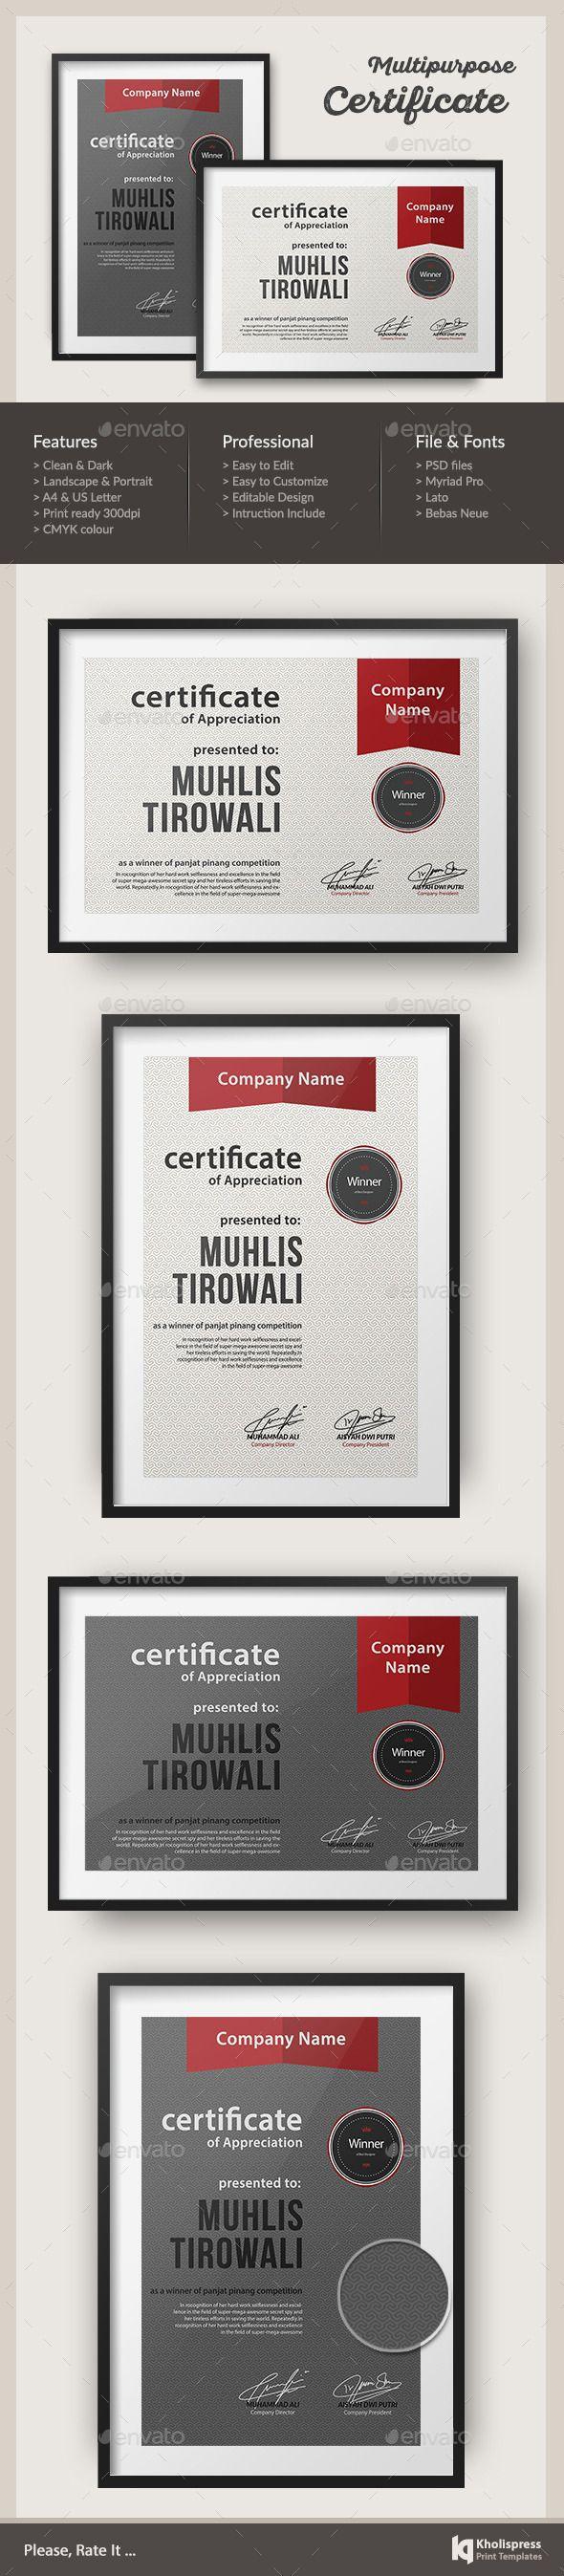 Pattern Certificate Template PSD. Download here: http://graphicriver.net/item/pattern-certificate/12292394?ref=ksioks